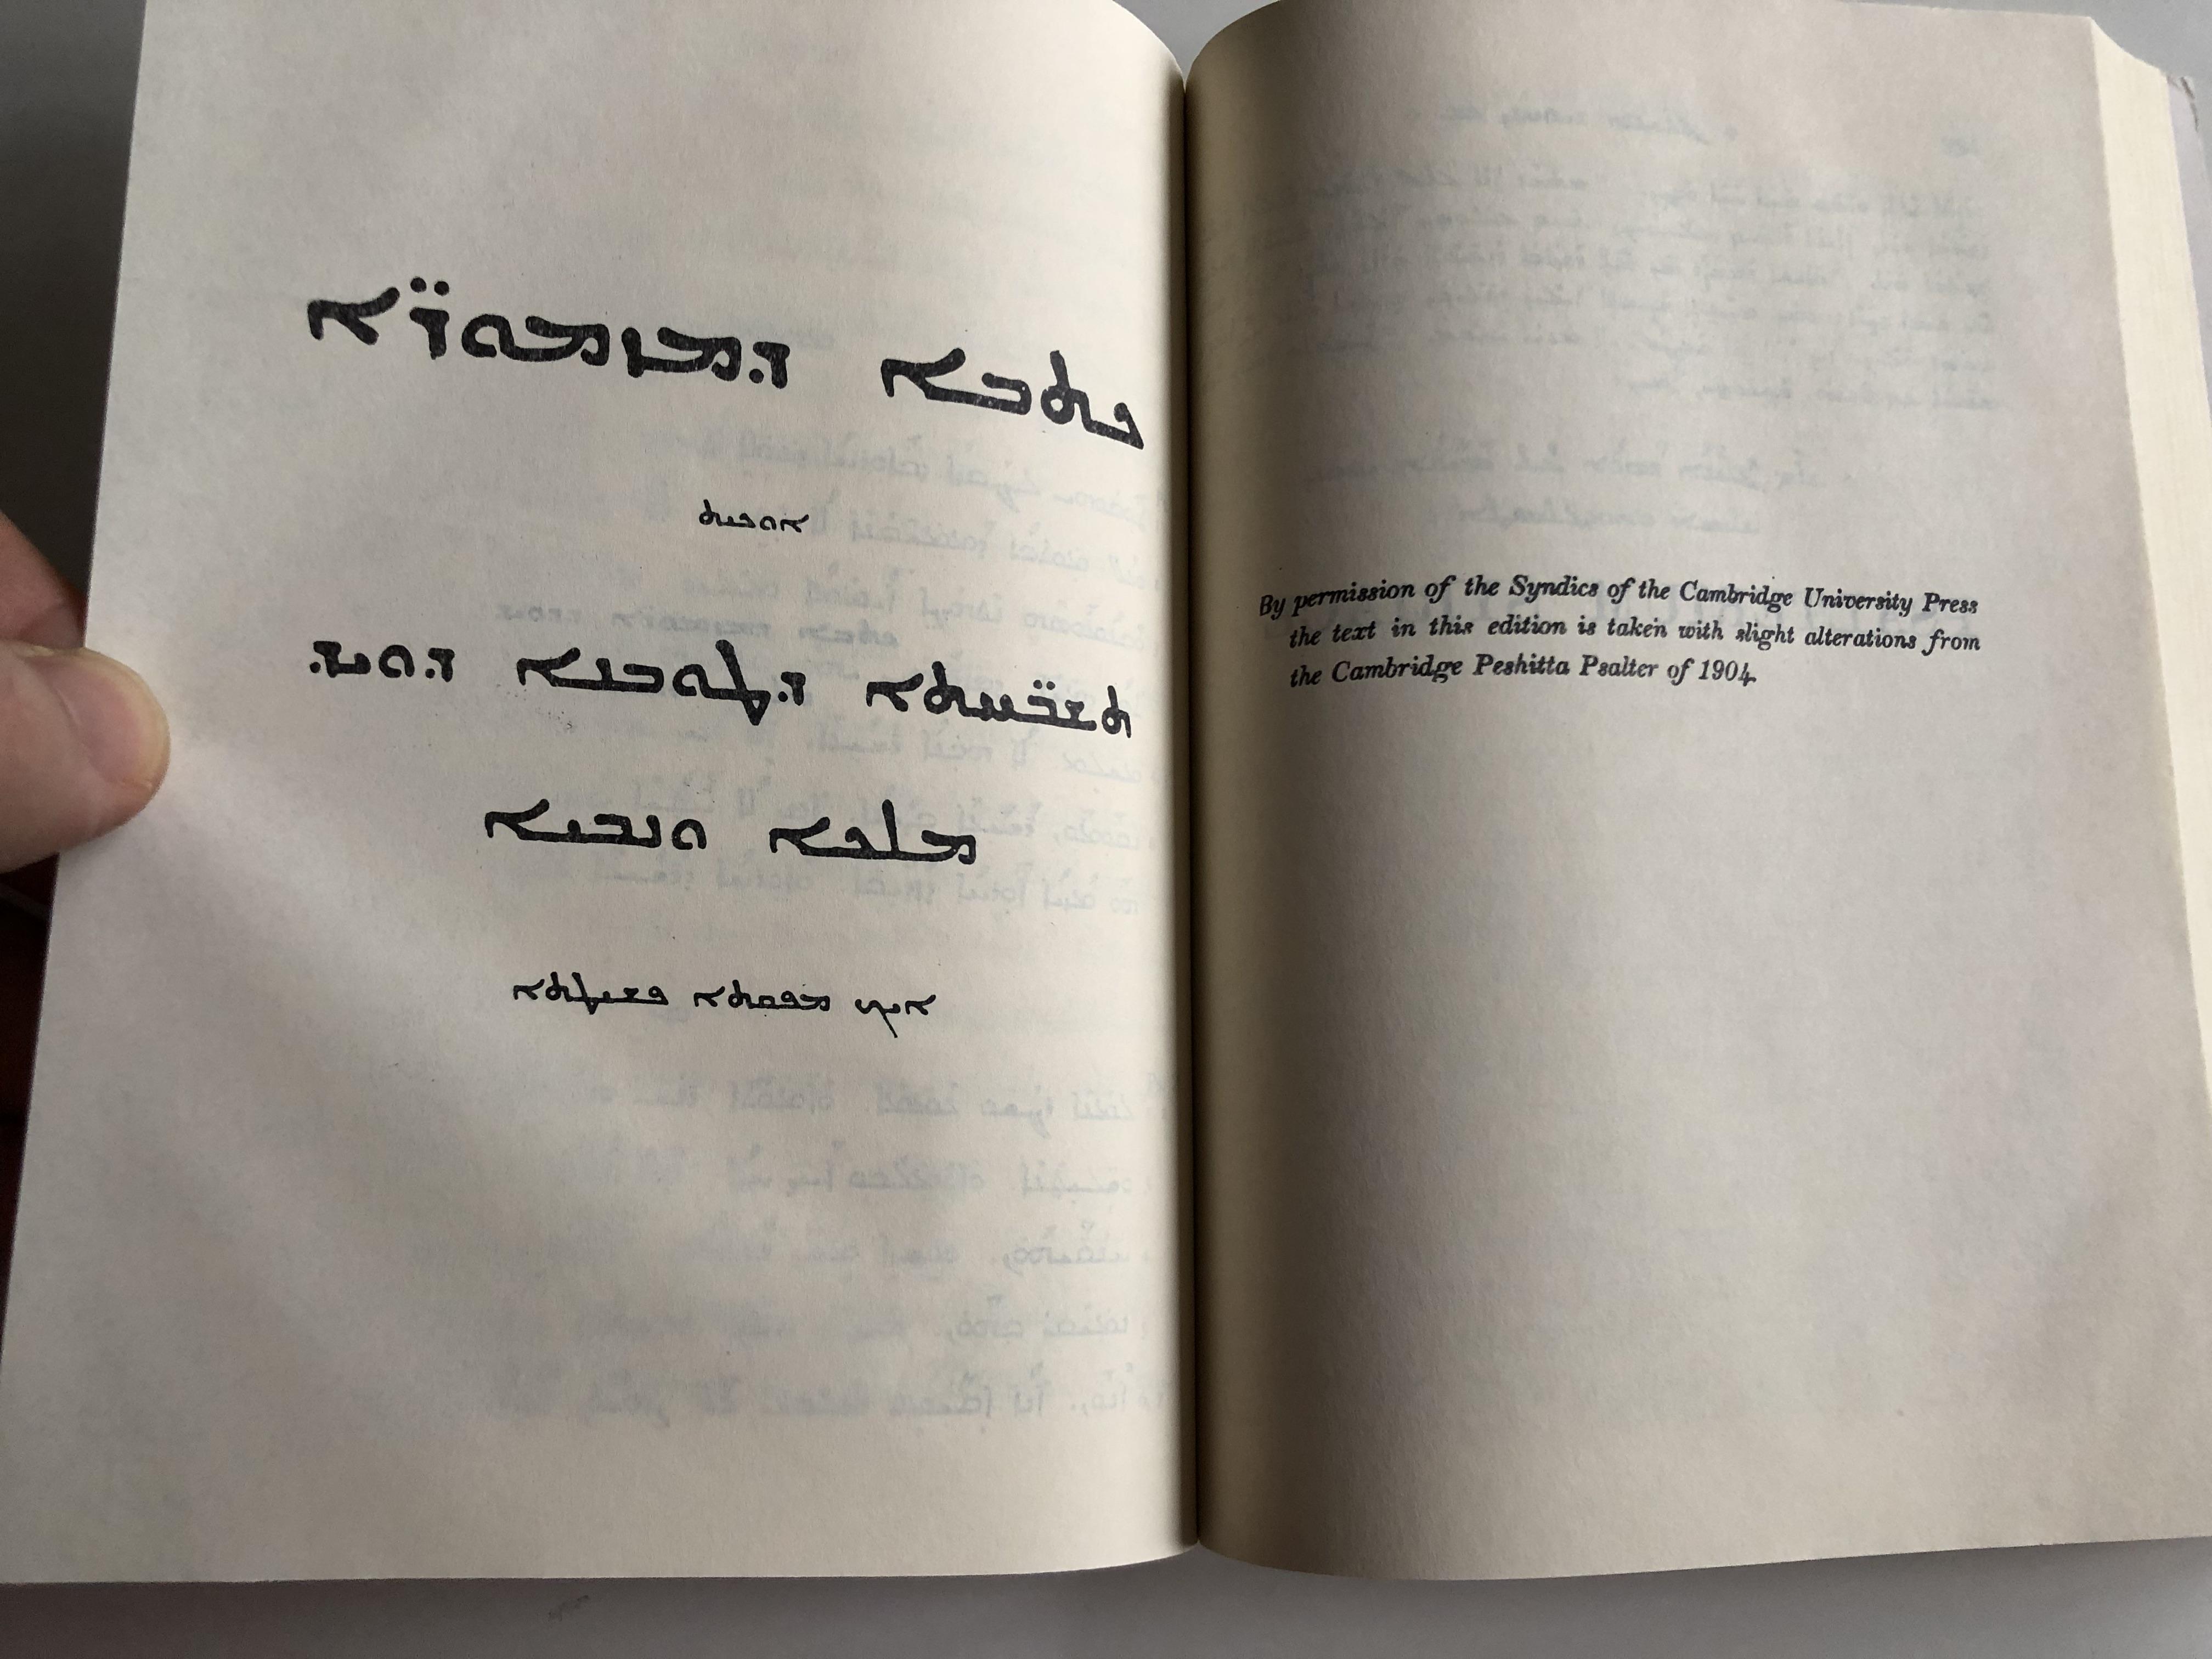 syriac-new-testament-and-psalms-ubs-epf-1998-pshitto-nt-10-.jpg